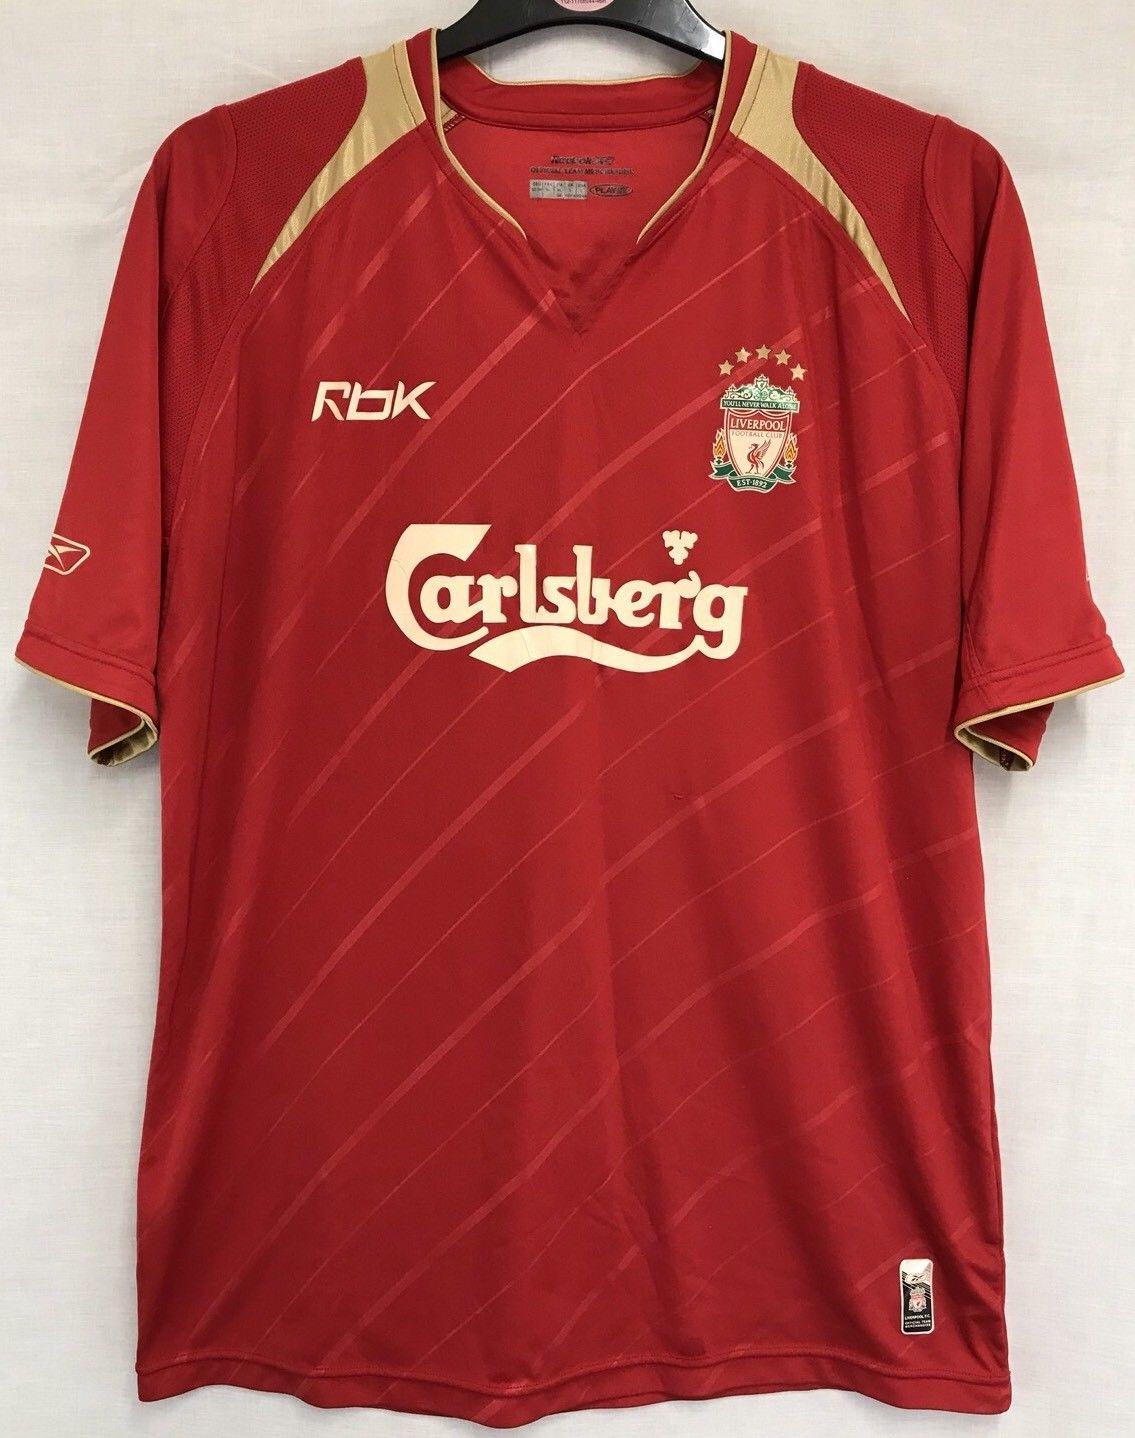 the best attitude 2a5a5 23a20 Liverpool Jamie Carragher 23 CL Football Shirt 2005/06 Adults Large Reebok